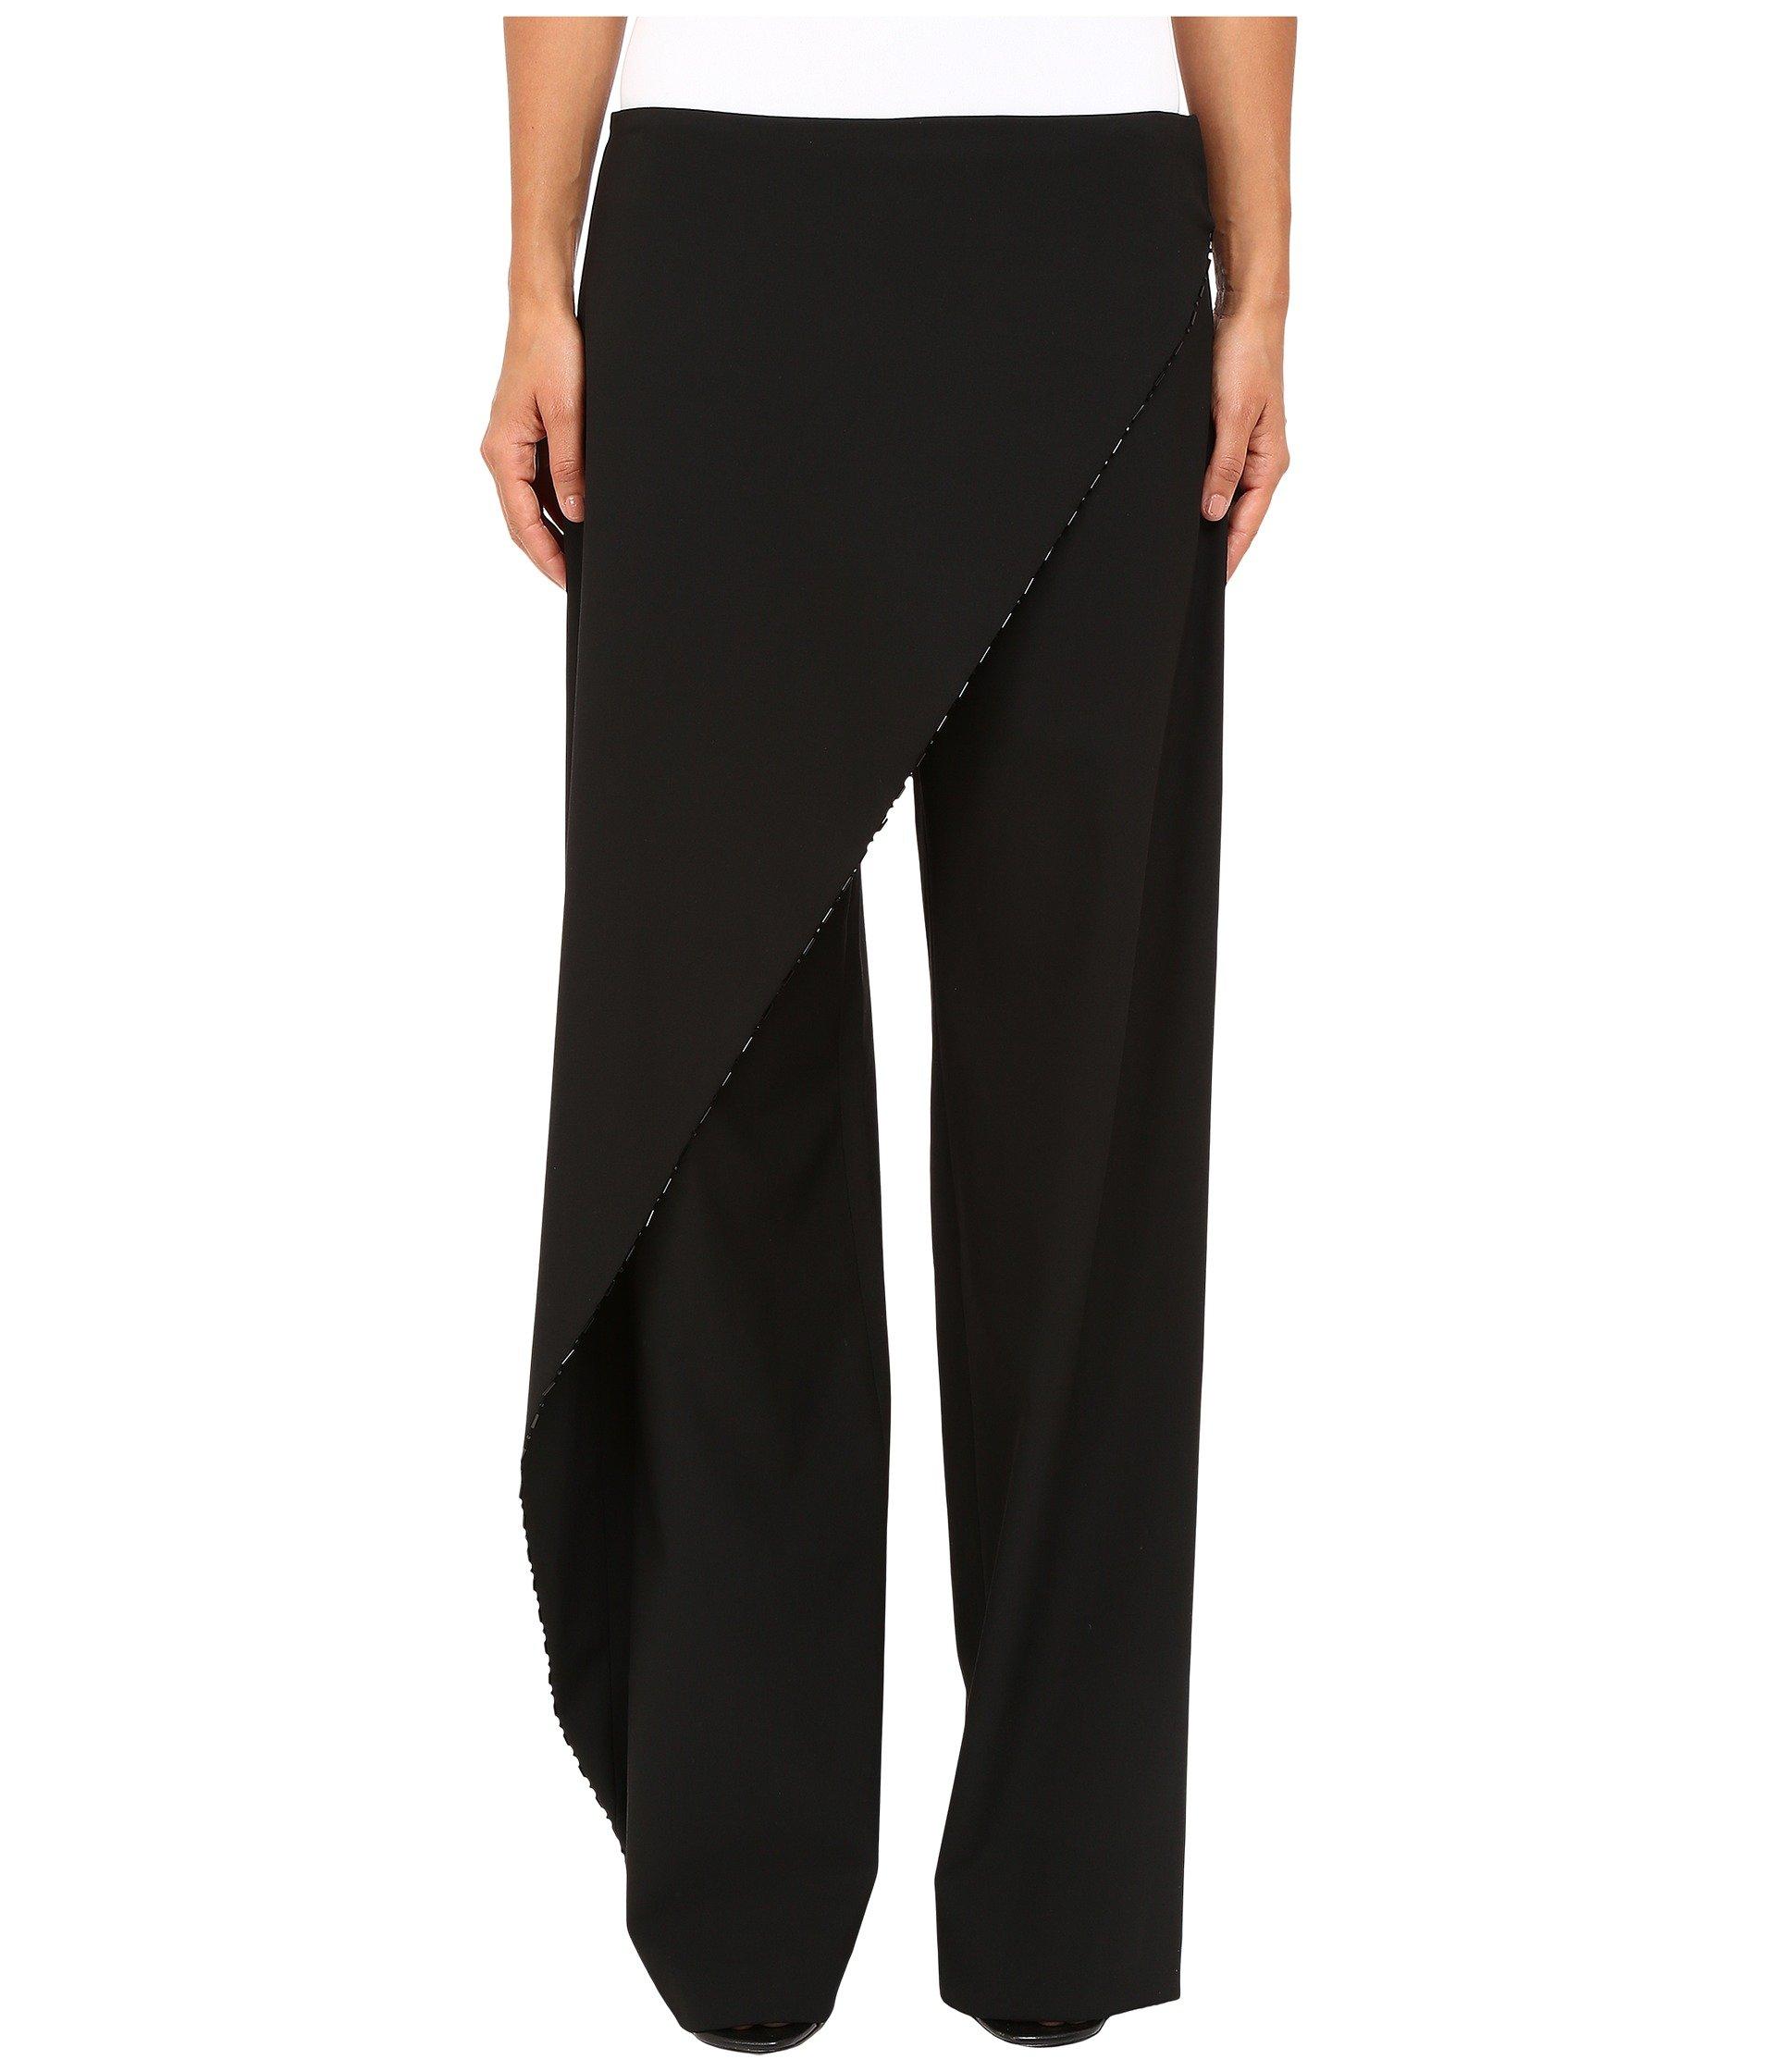 Pantalón para Mujer Zac Posen Stretch Cady Pants Skirt  + Zac Posen en VeoyCompro.net